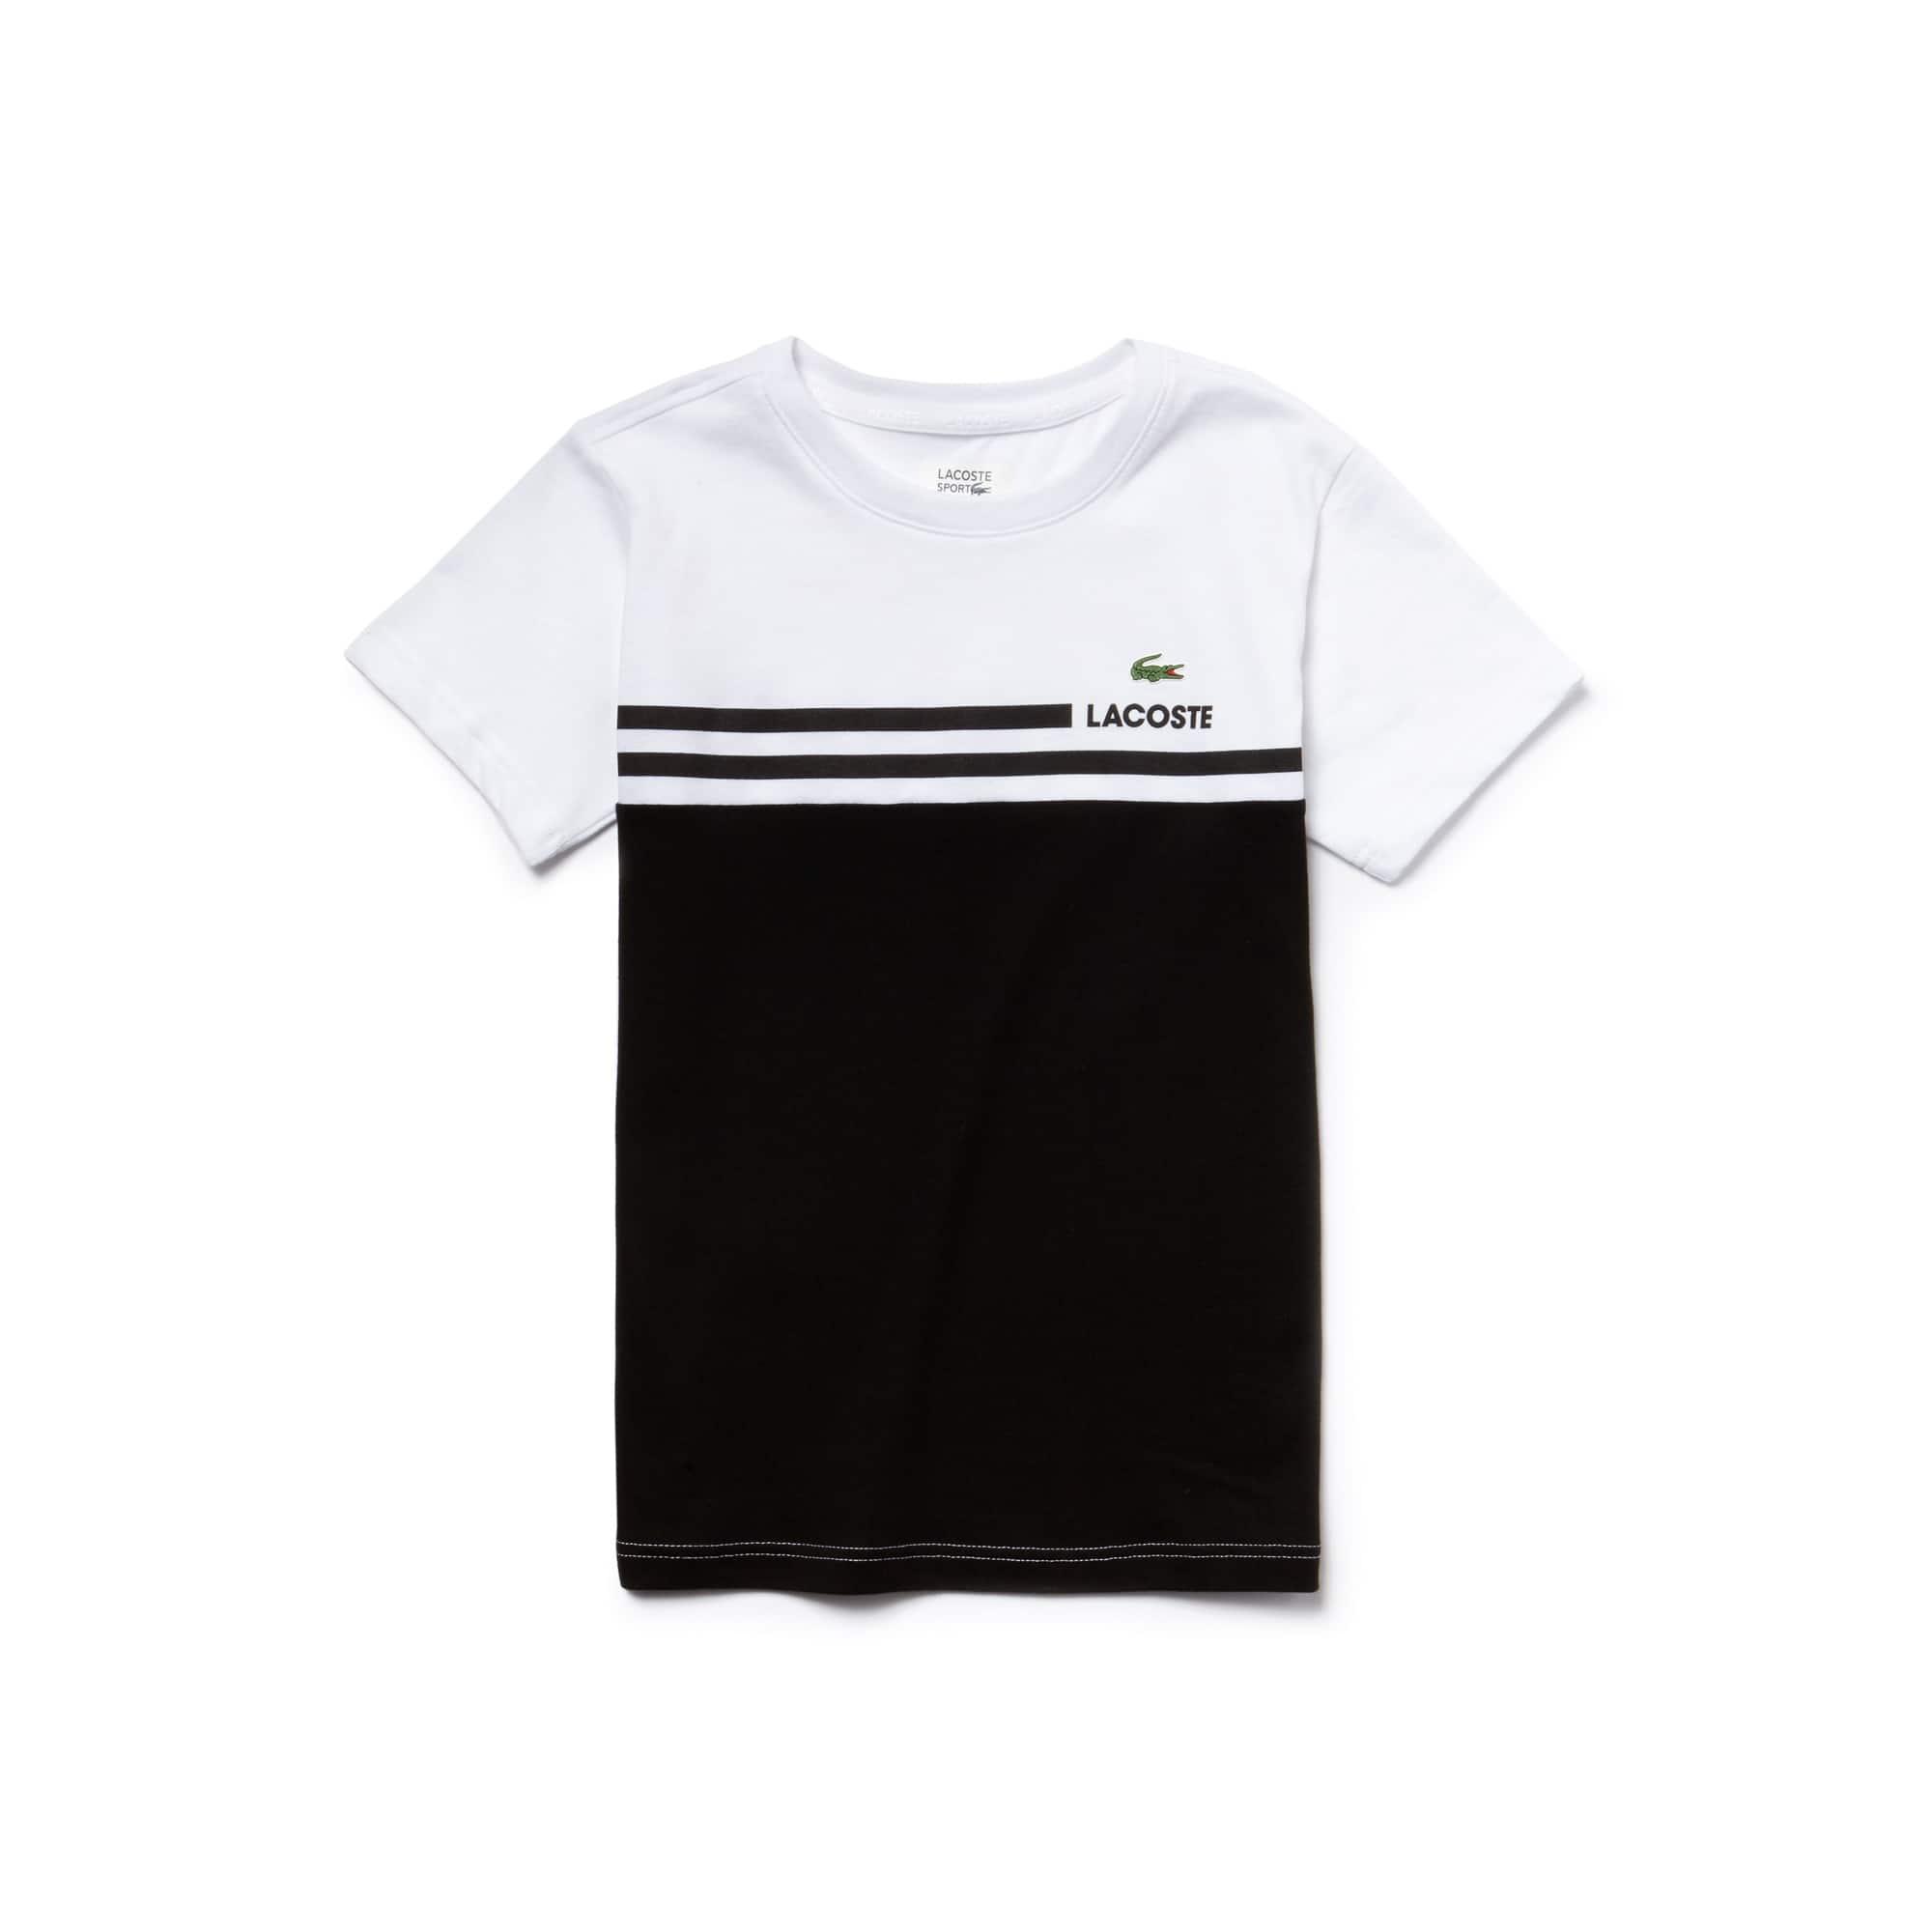 Lacoste SPORT Tennis-T-shirt jongens technische jersey colorblock